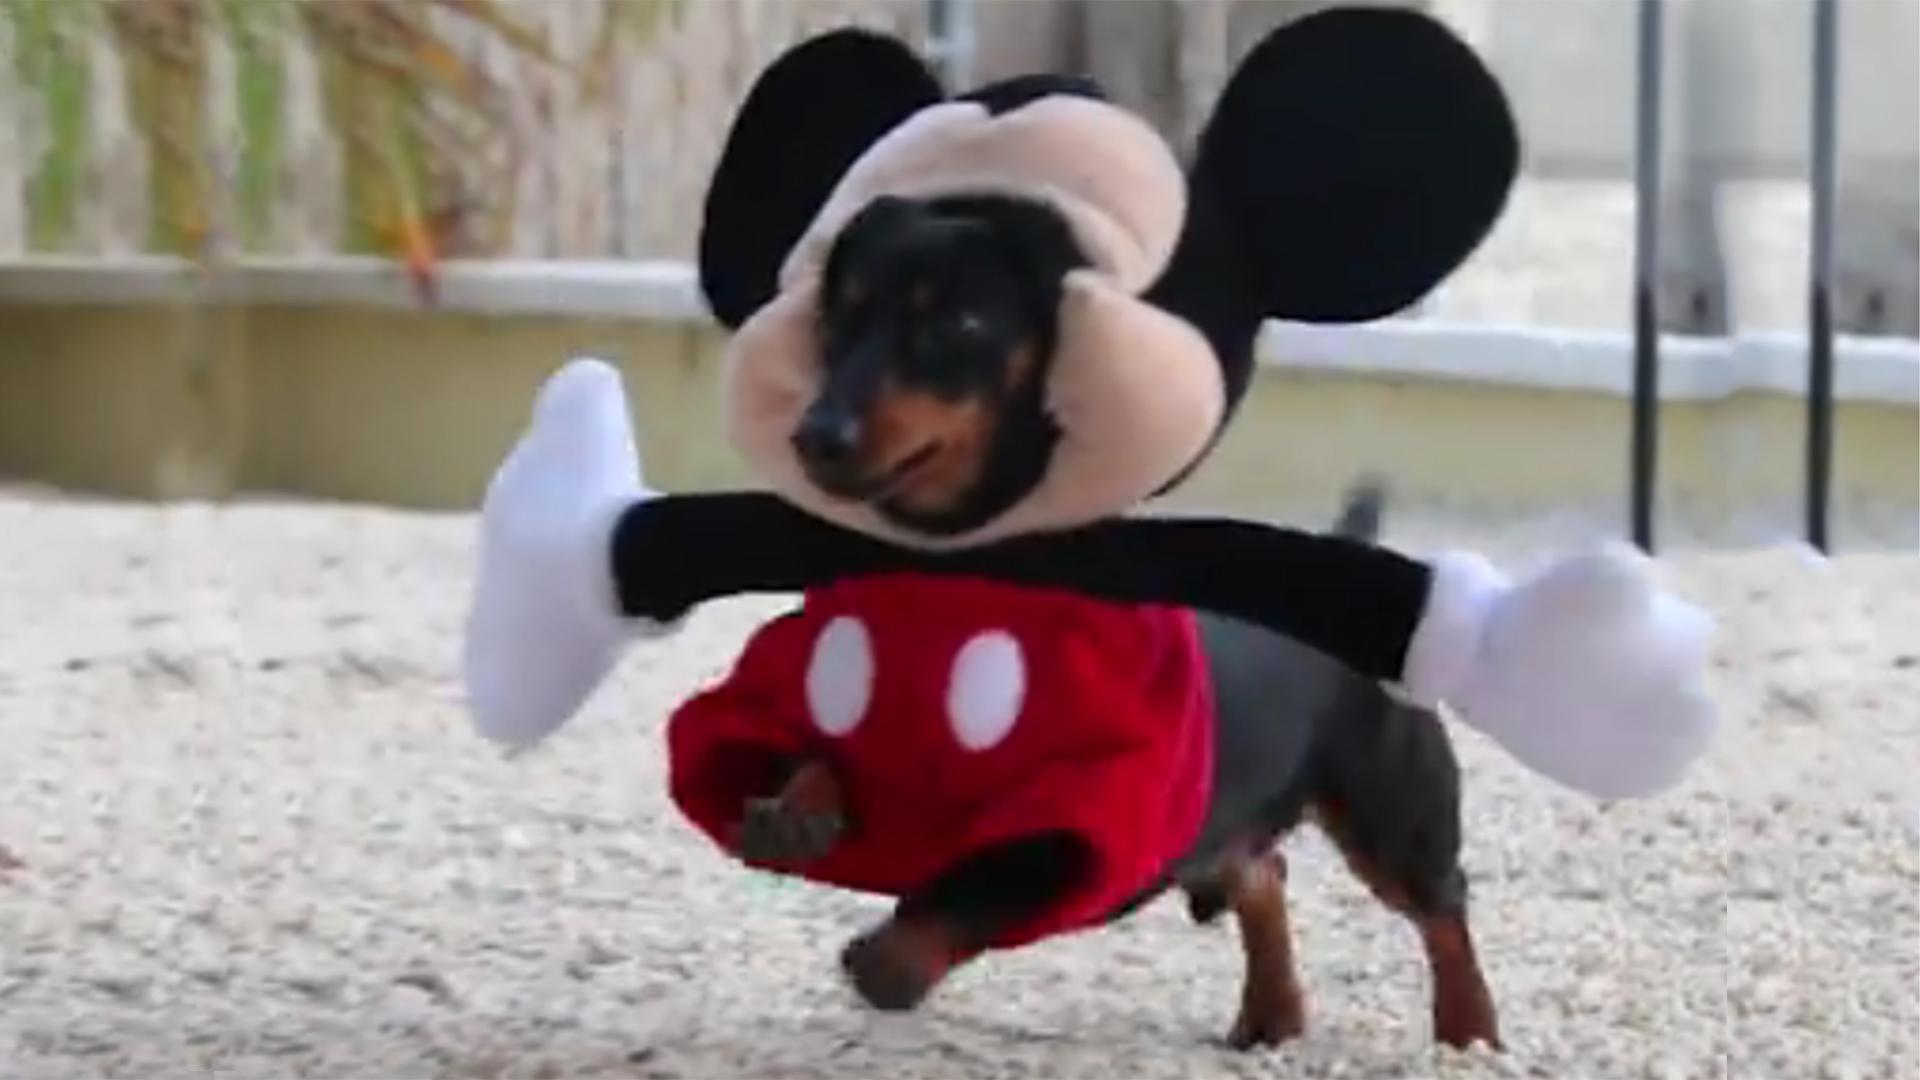 Fantastic Wallpaper Halloween Puppy - dog-dachshund-micky-mouse-tease-120419_ebe81f6c4f598f4b9946c7529f04244c  2018_166367.jpg